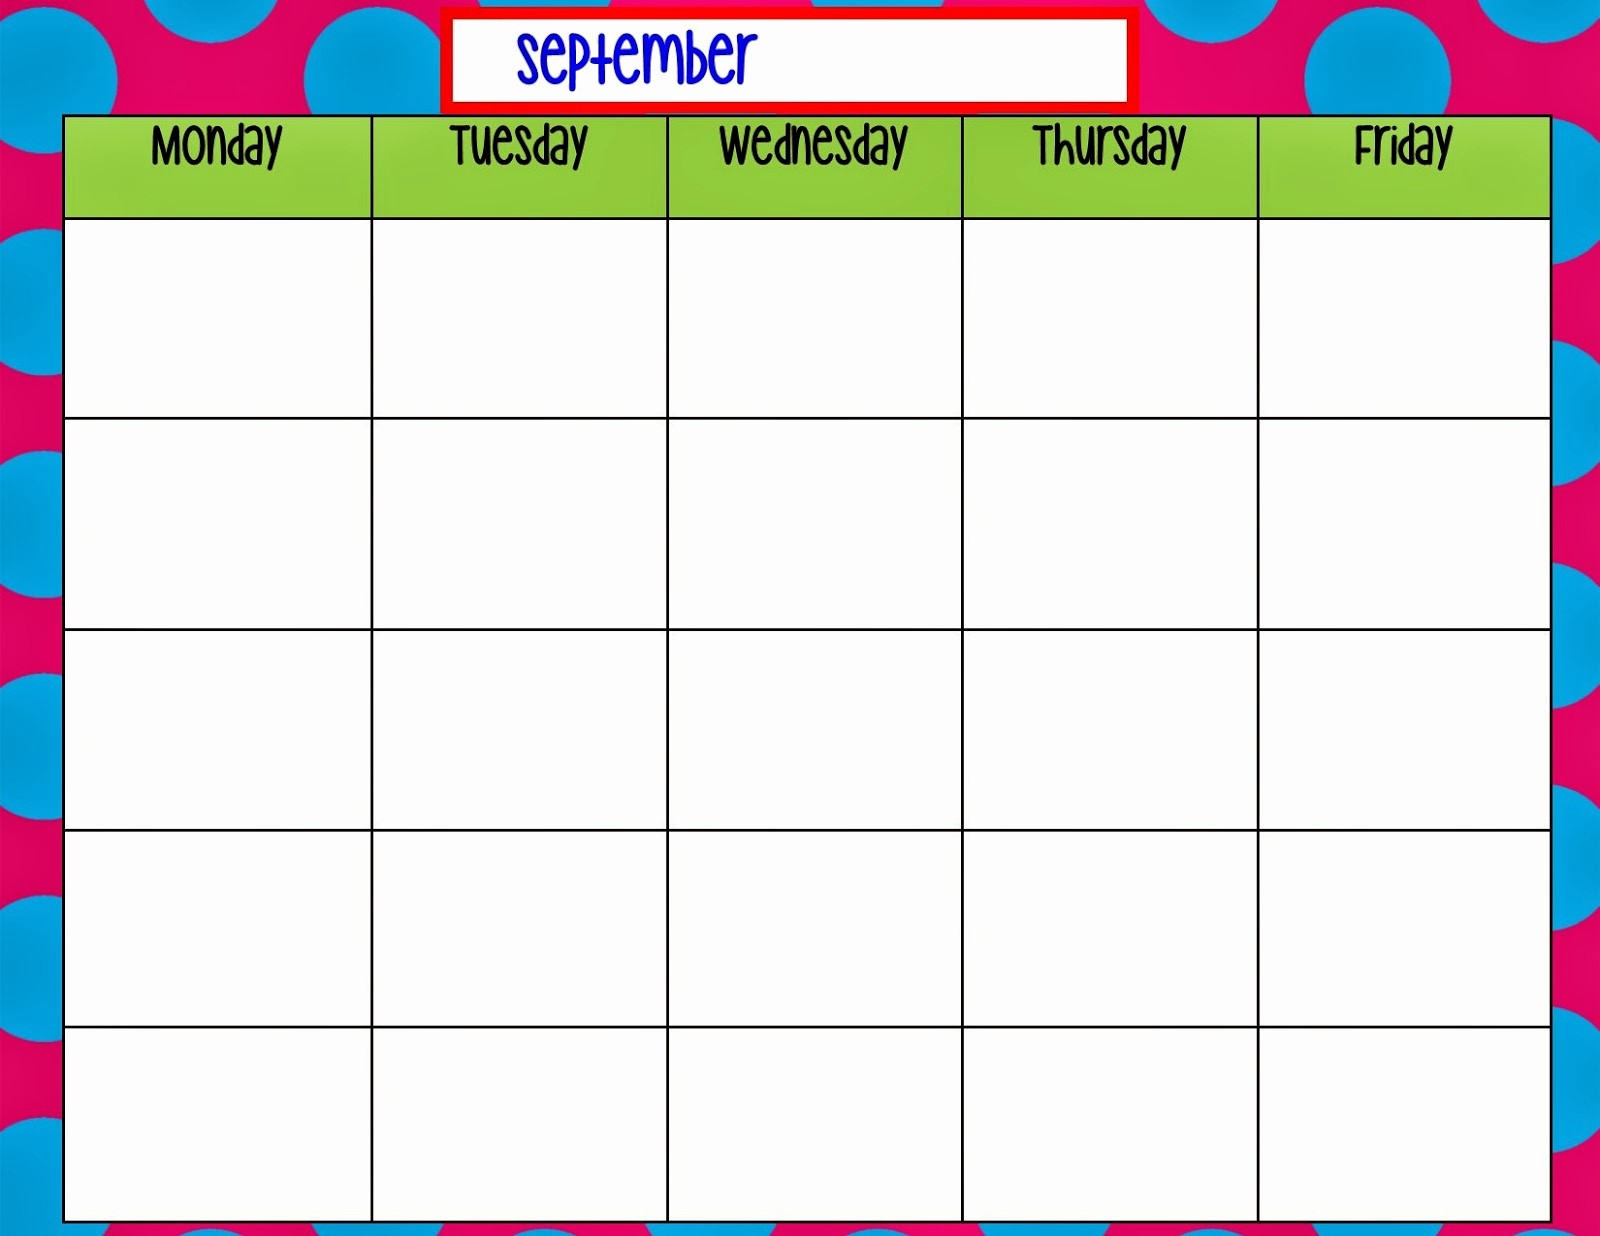 Monday Through Sunday Calendar Template Inspirational Blank Weekly Calendar Monday Through Friday 2018